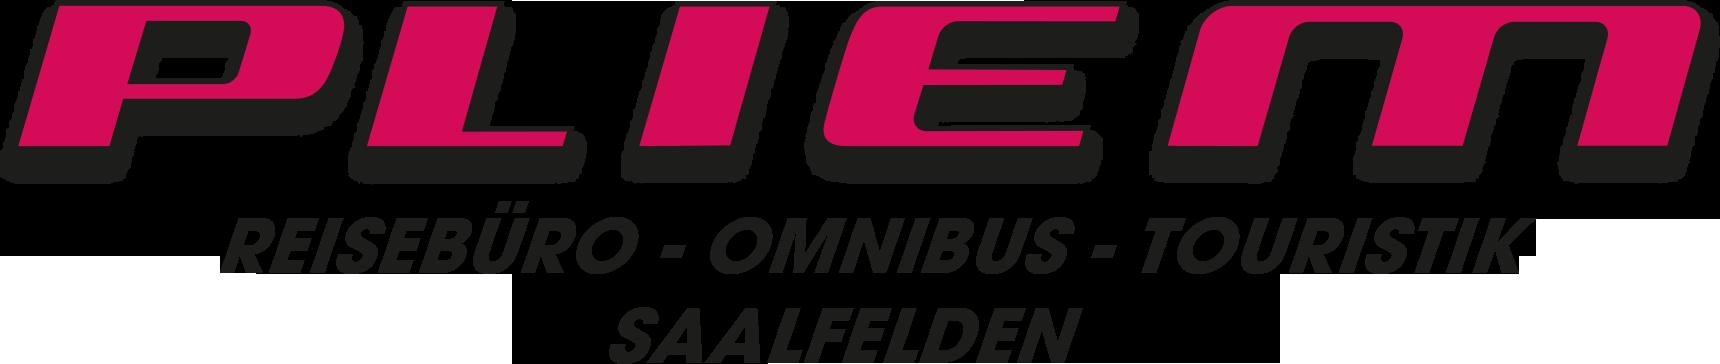 Pliem Reisebüro - Omnibus - Touristik - Saalfelden